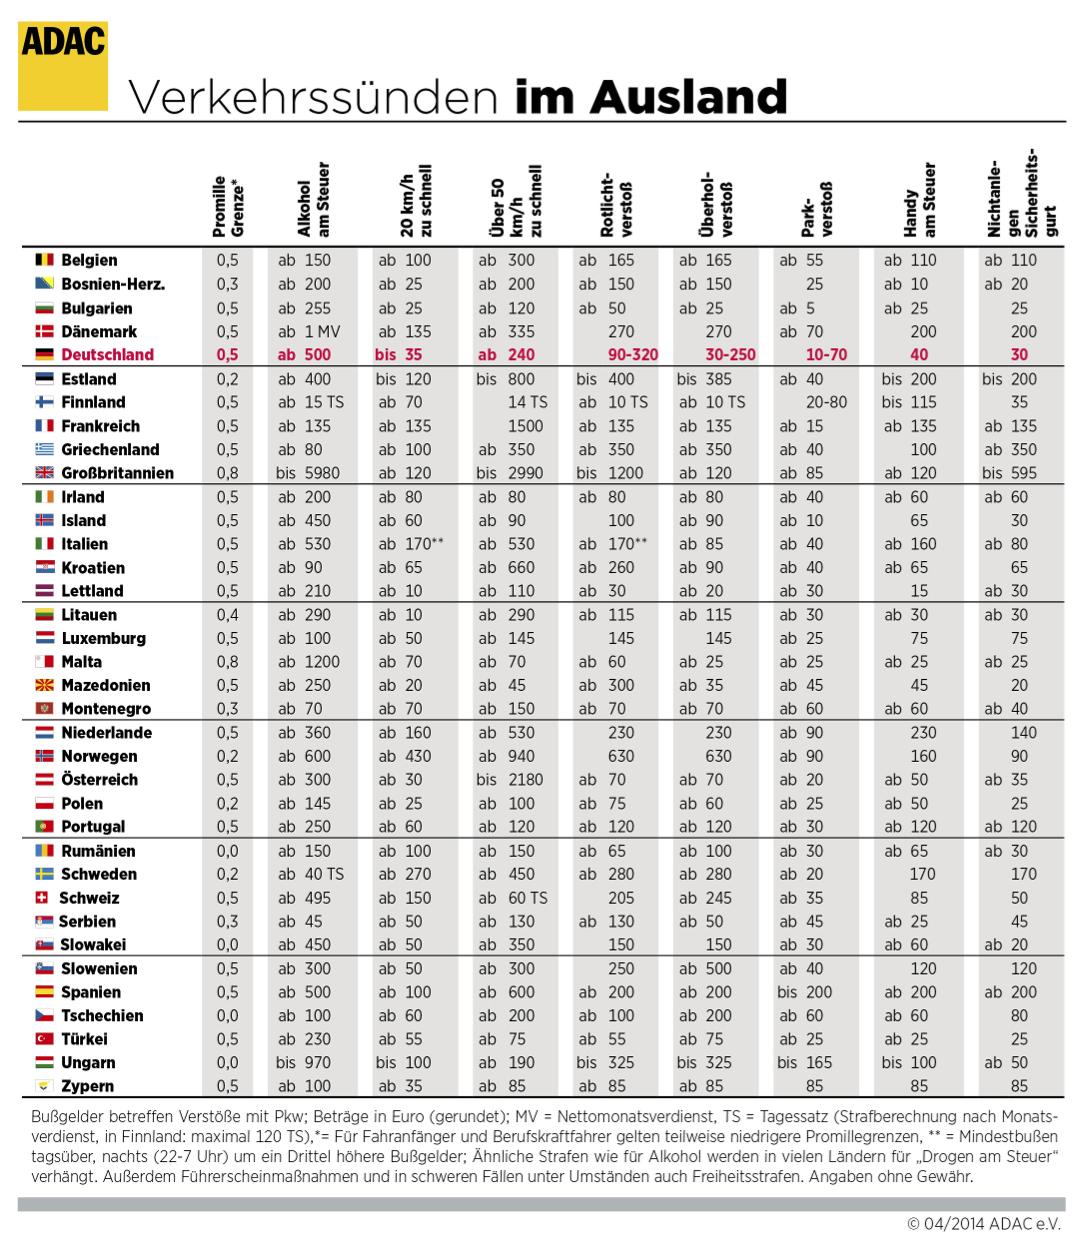 verkehrssunden-im-ausland-2014_204014.jpg